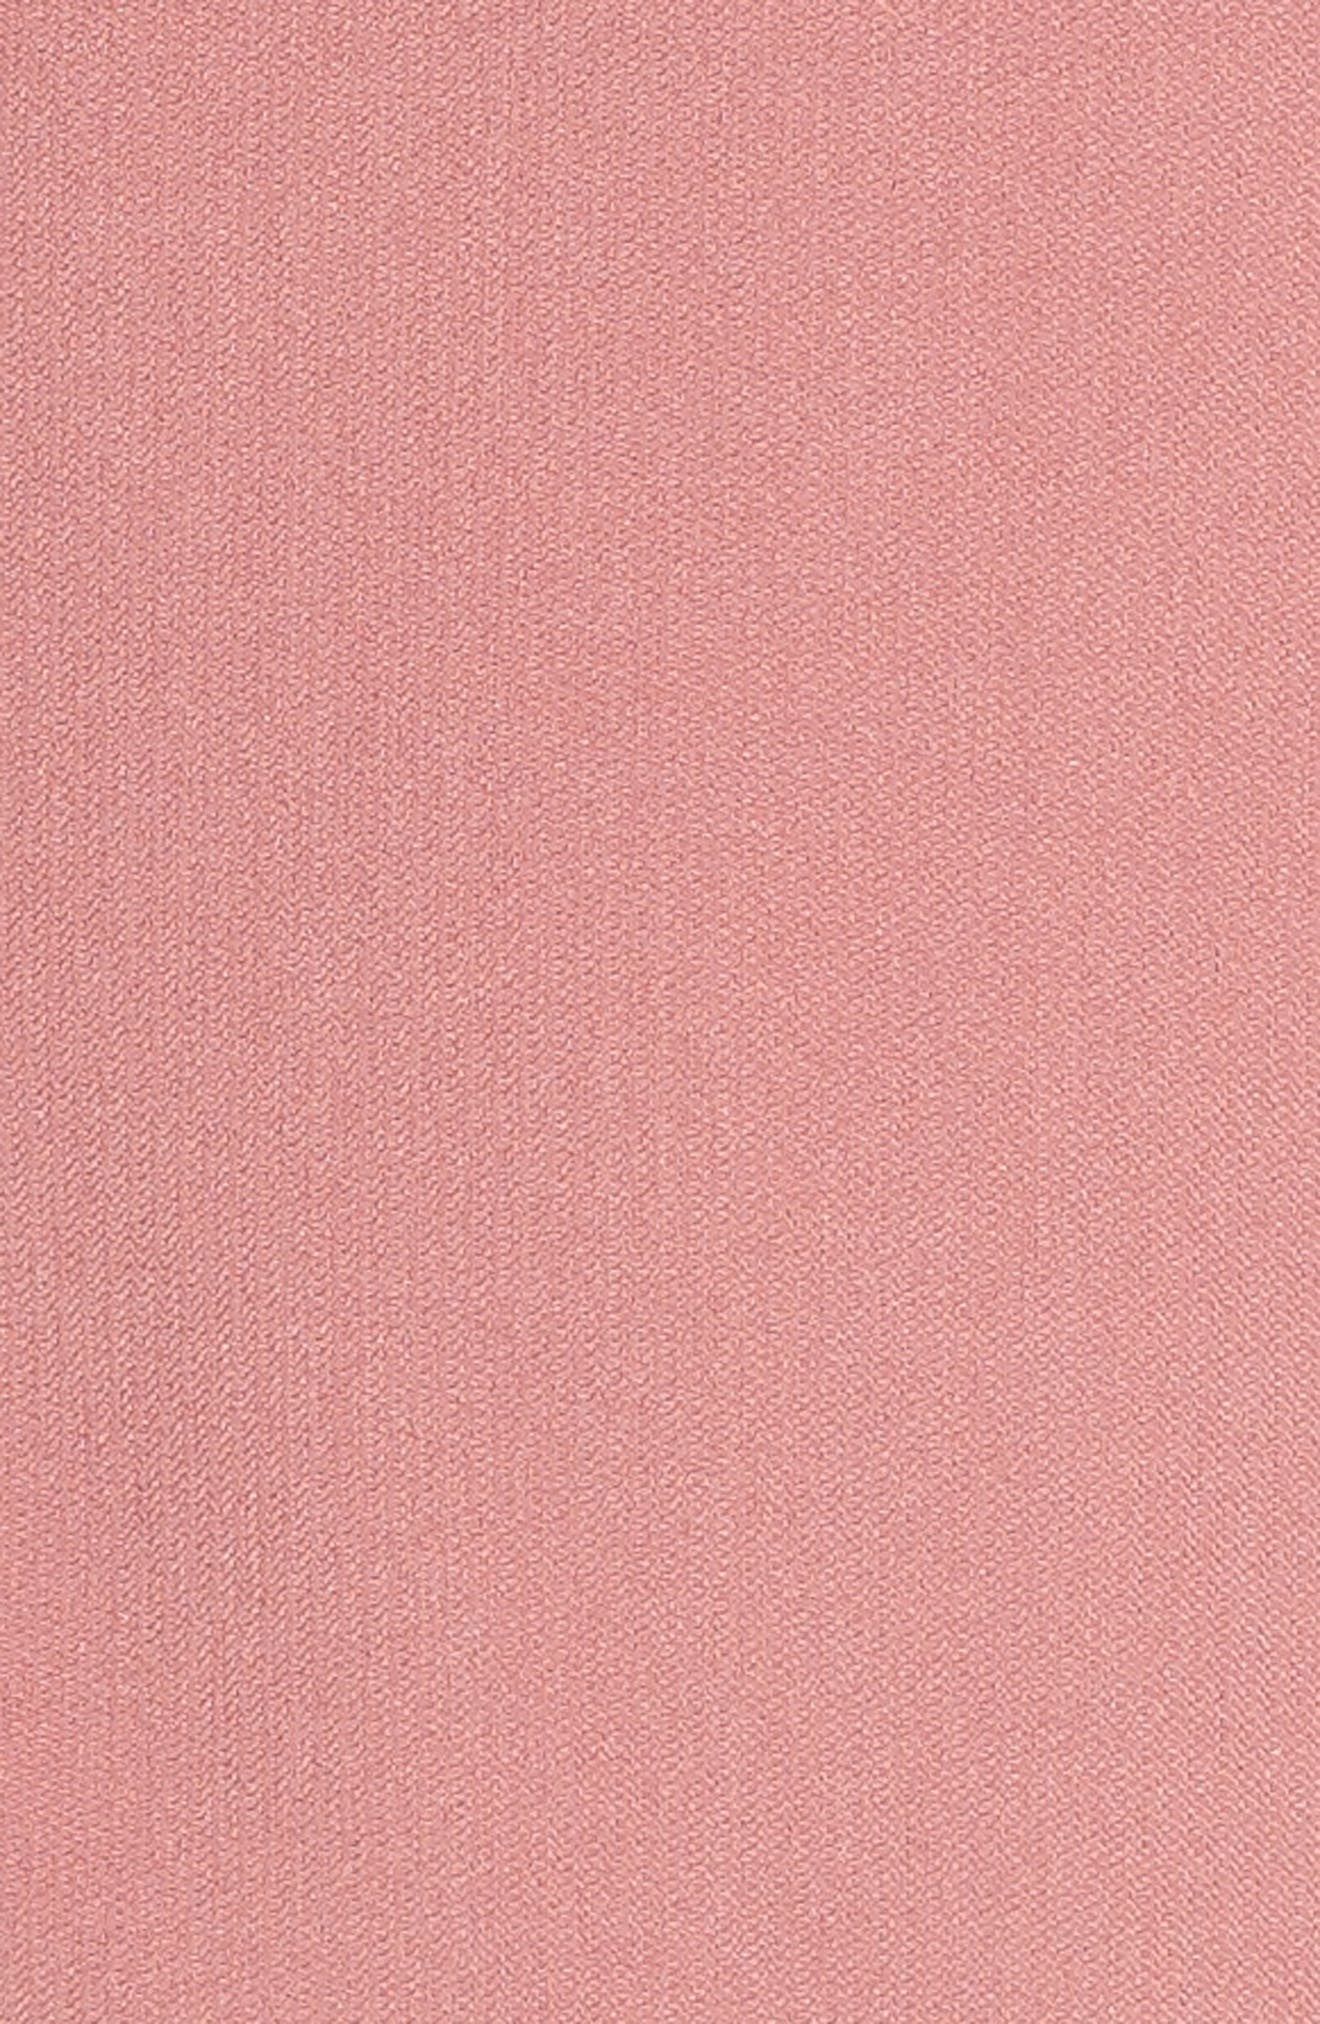 Embellished Sheath Dress,                             Alternate thumbnail 5, color,